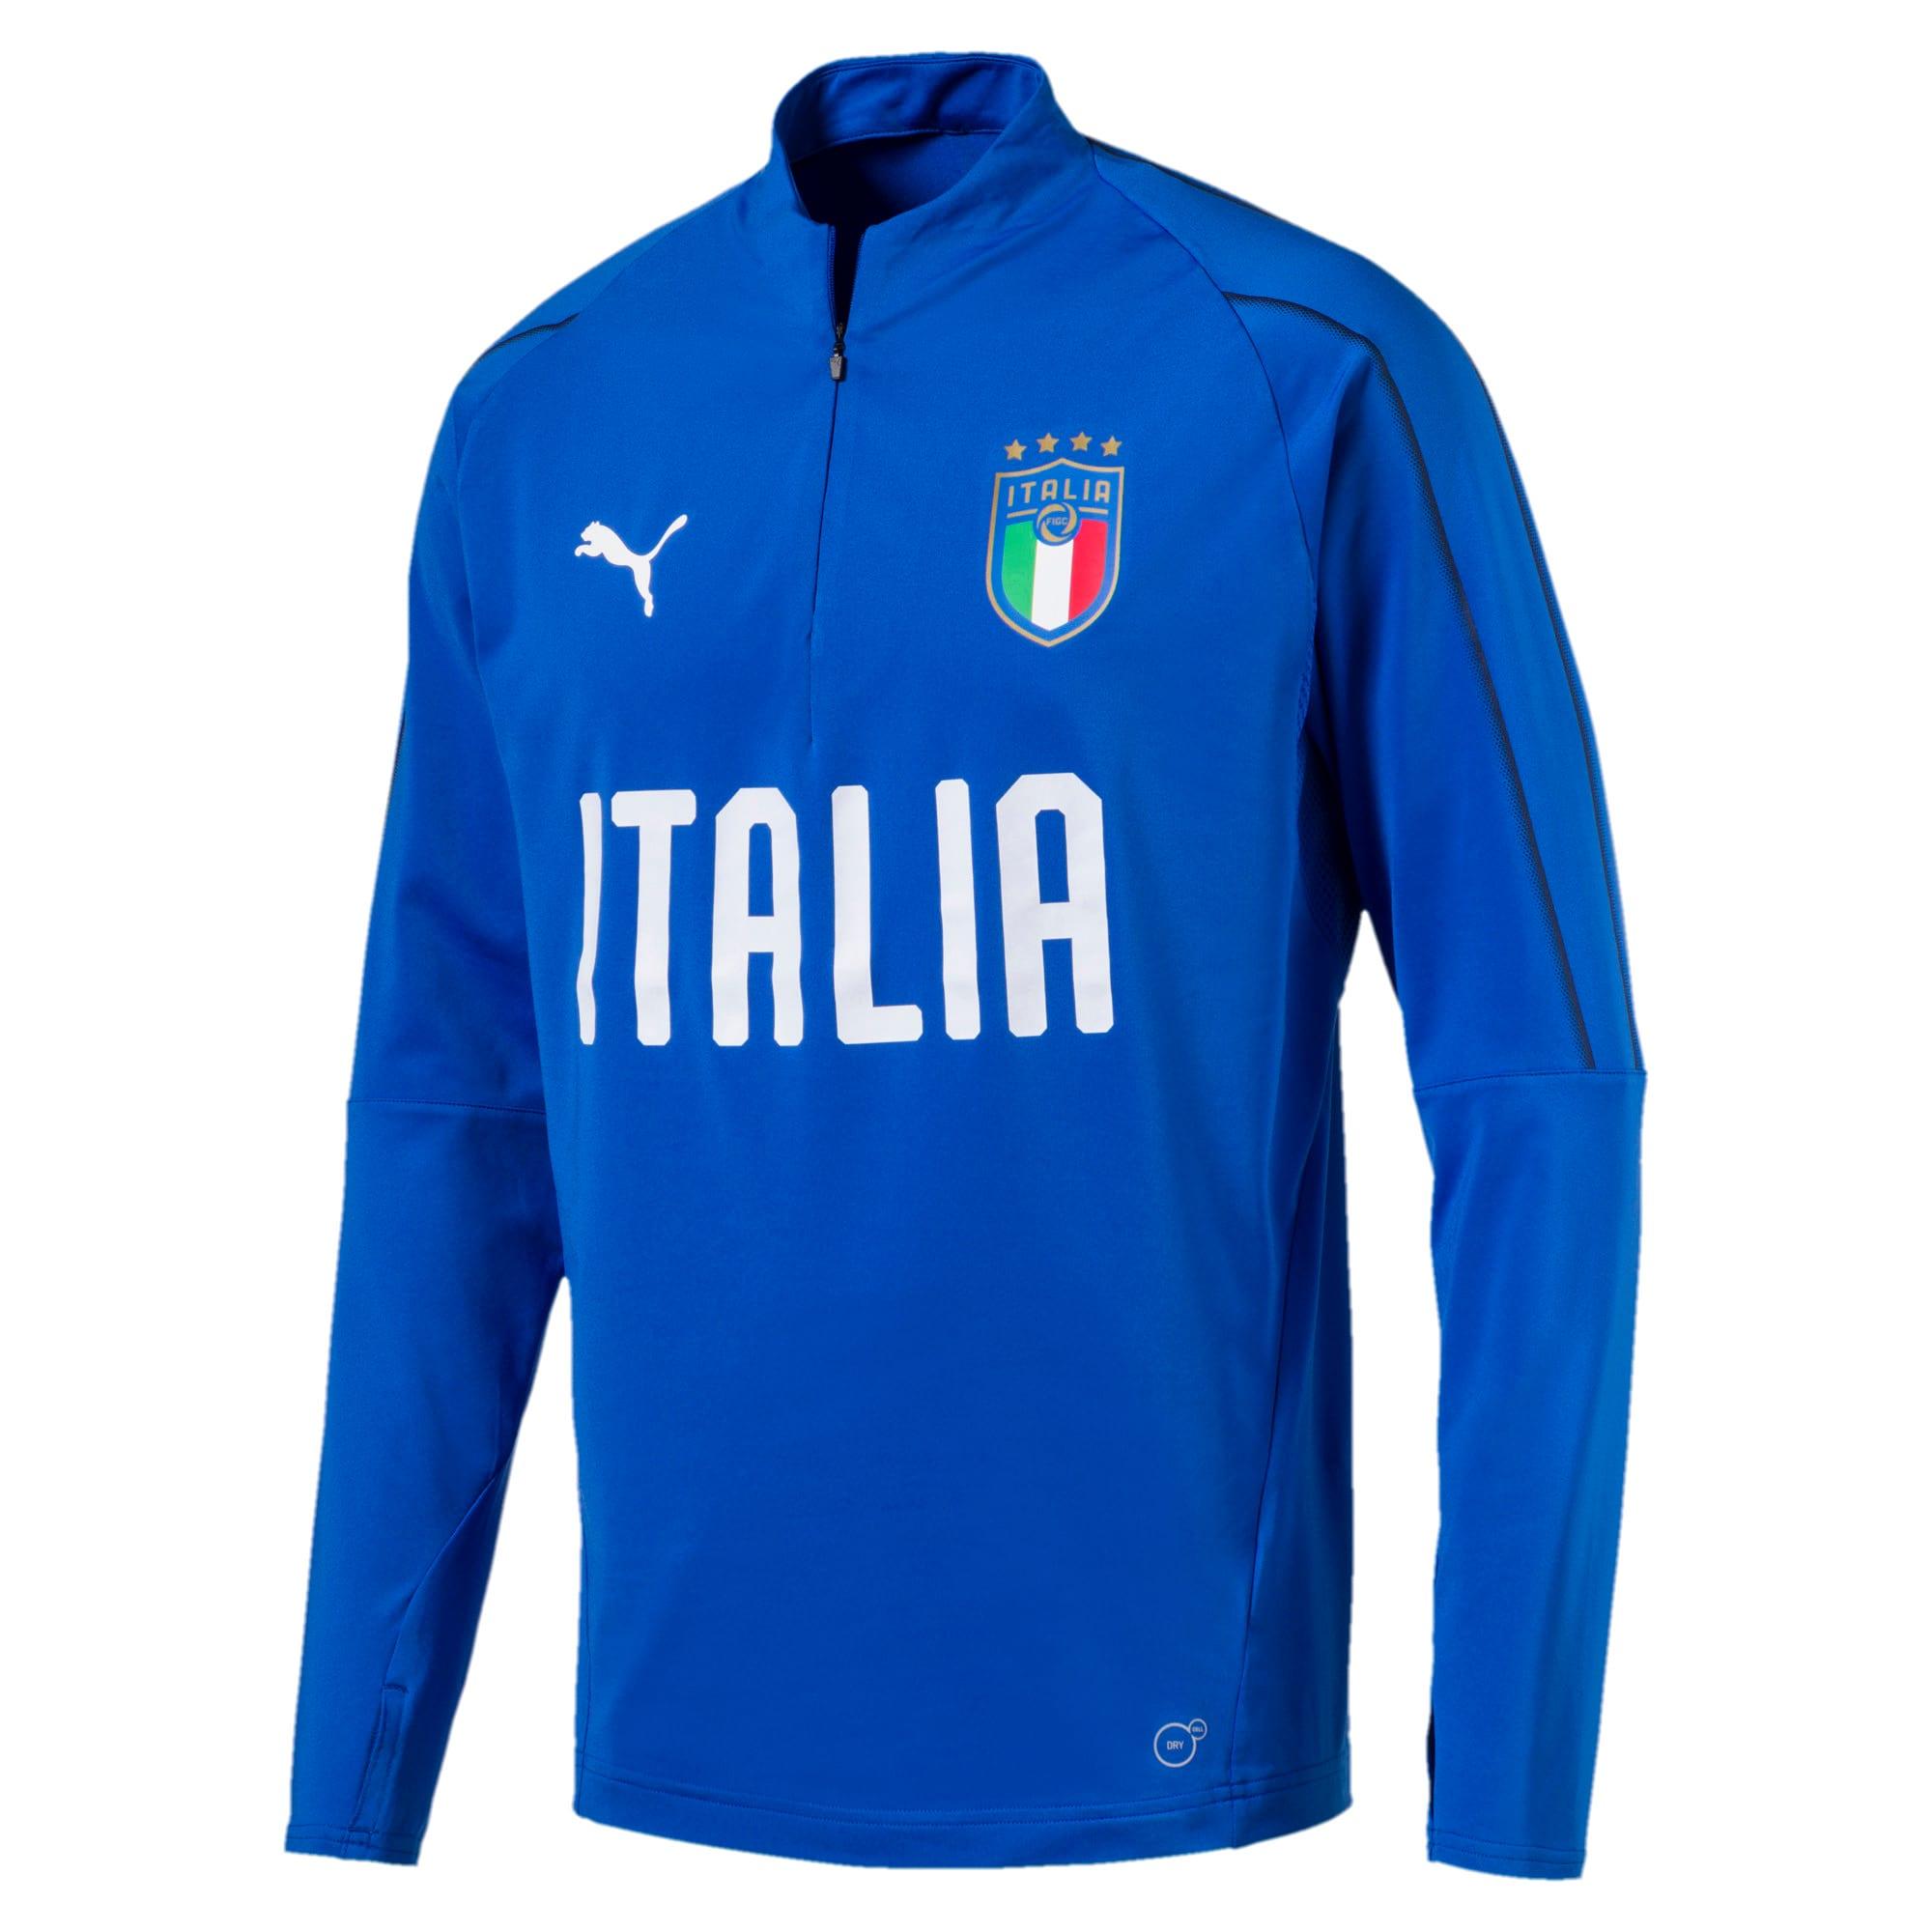 Thumbnail 1 of Italia 1/4 Zip Training Top, Team Power Blue-White, medium